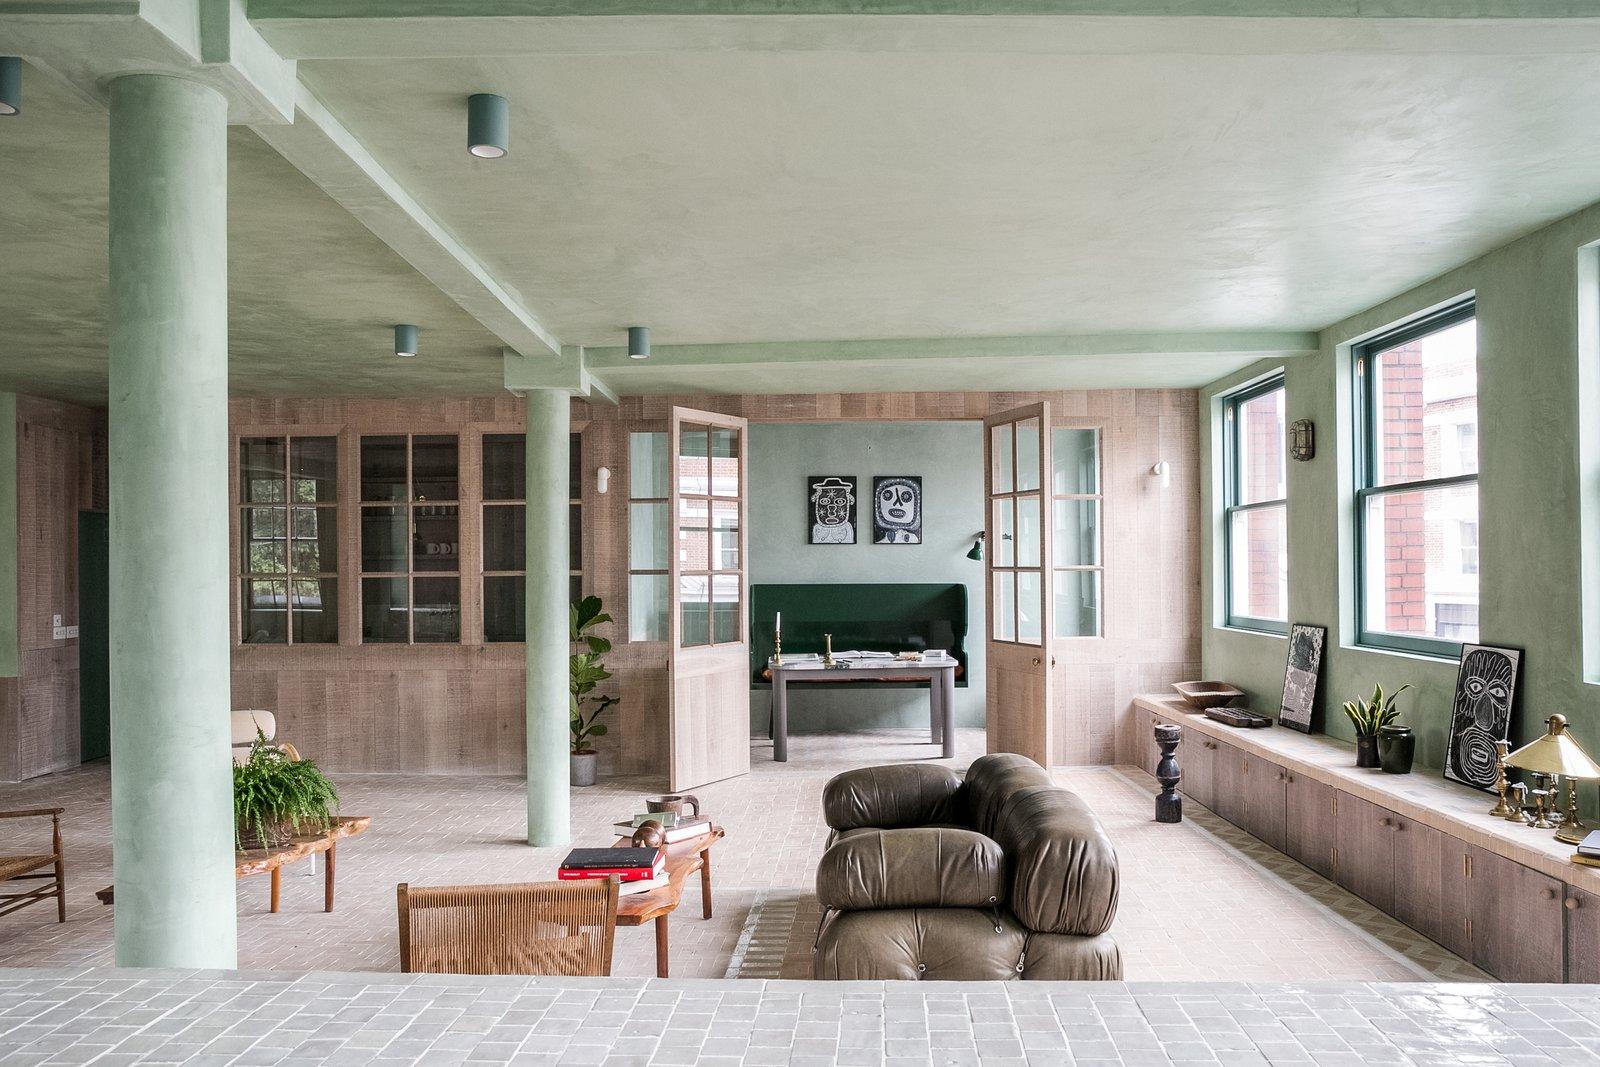 The Beldi Chan + Eayrs living room